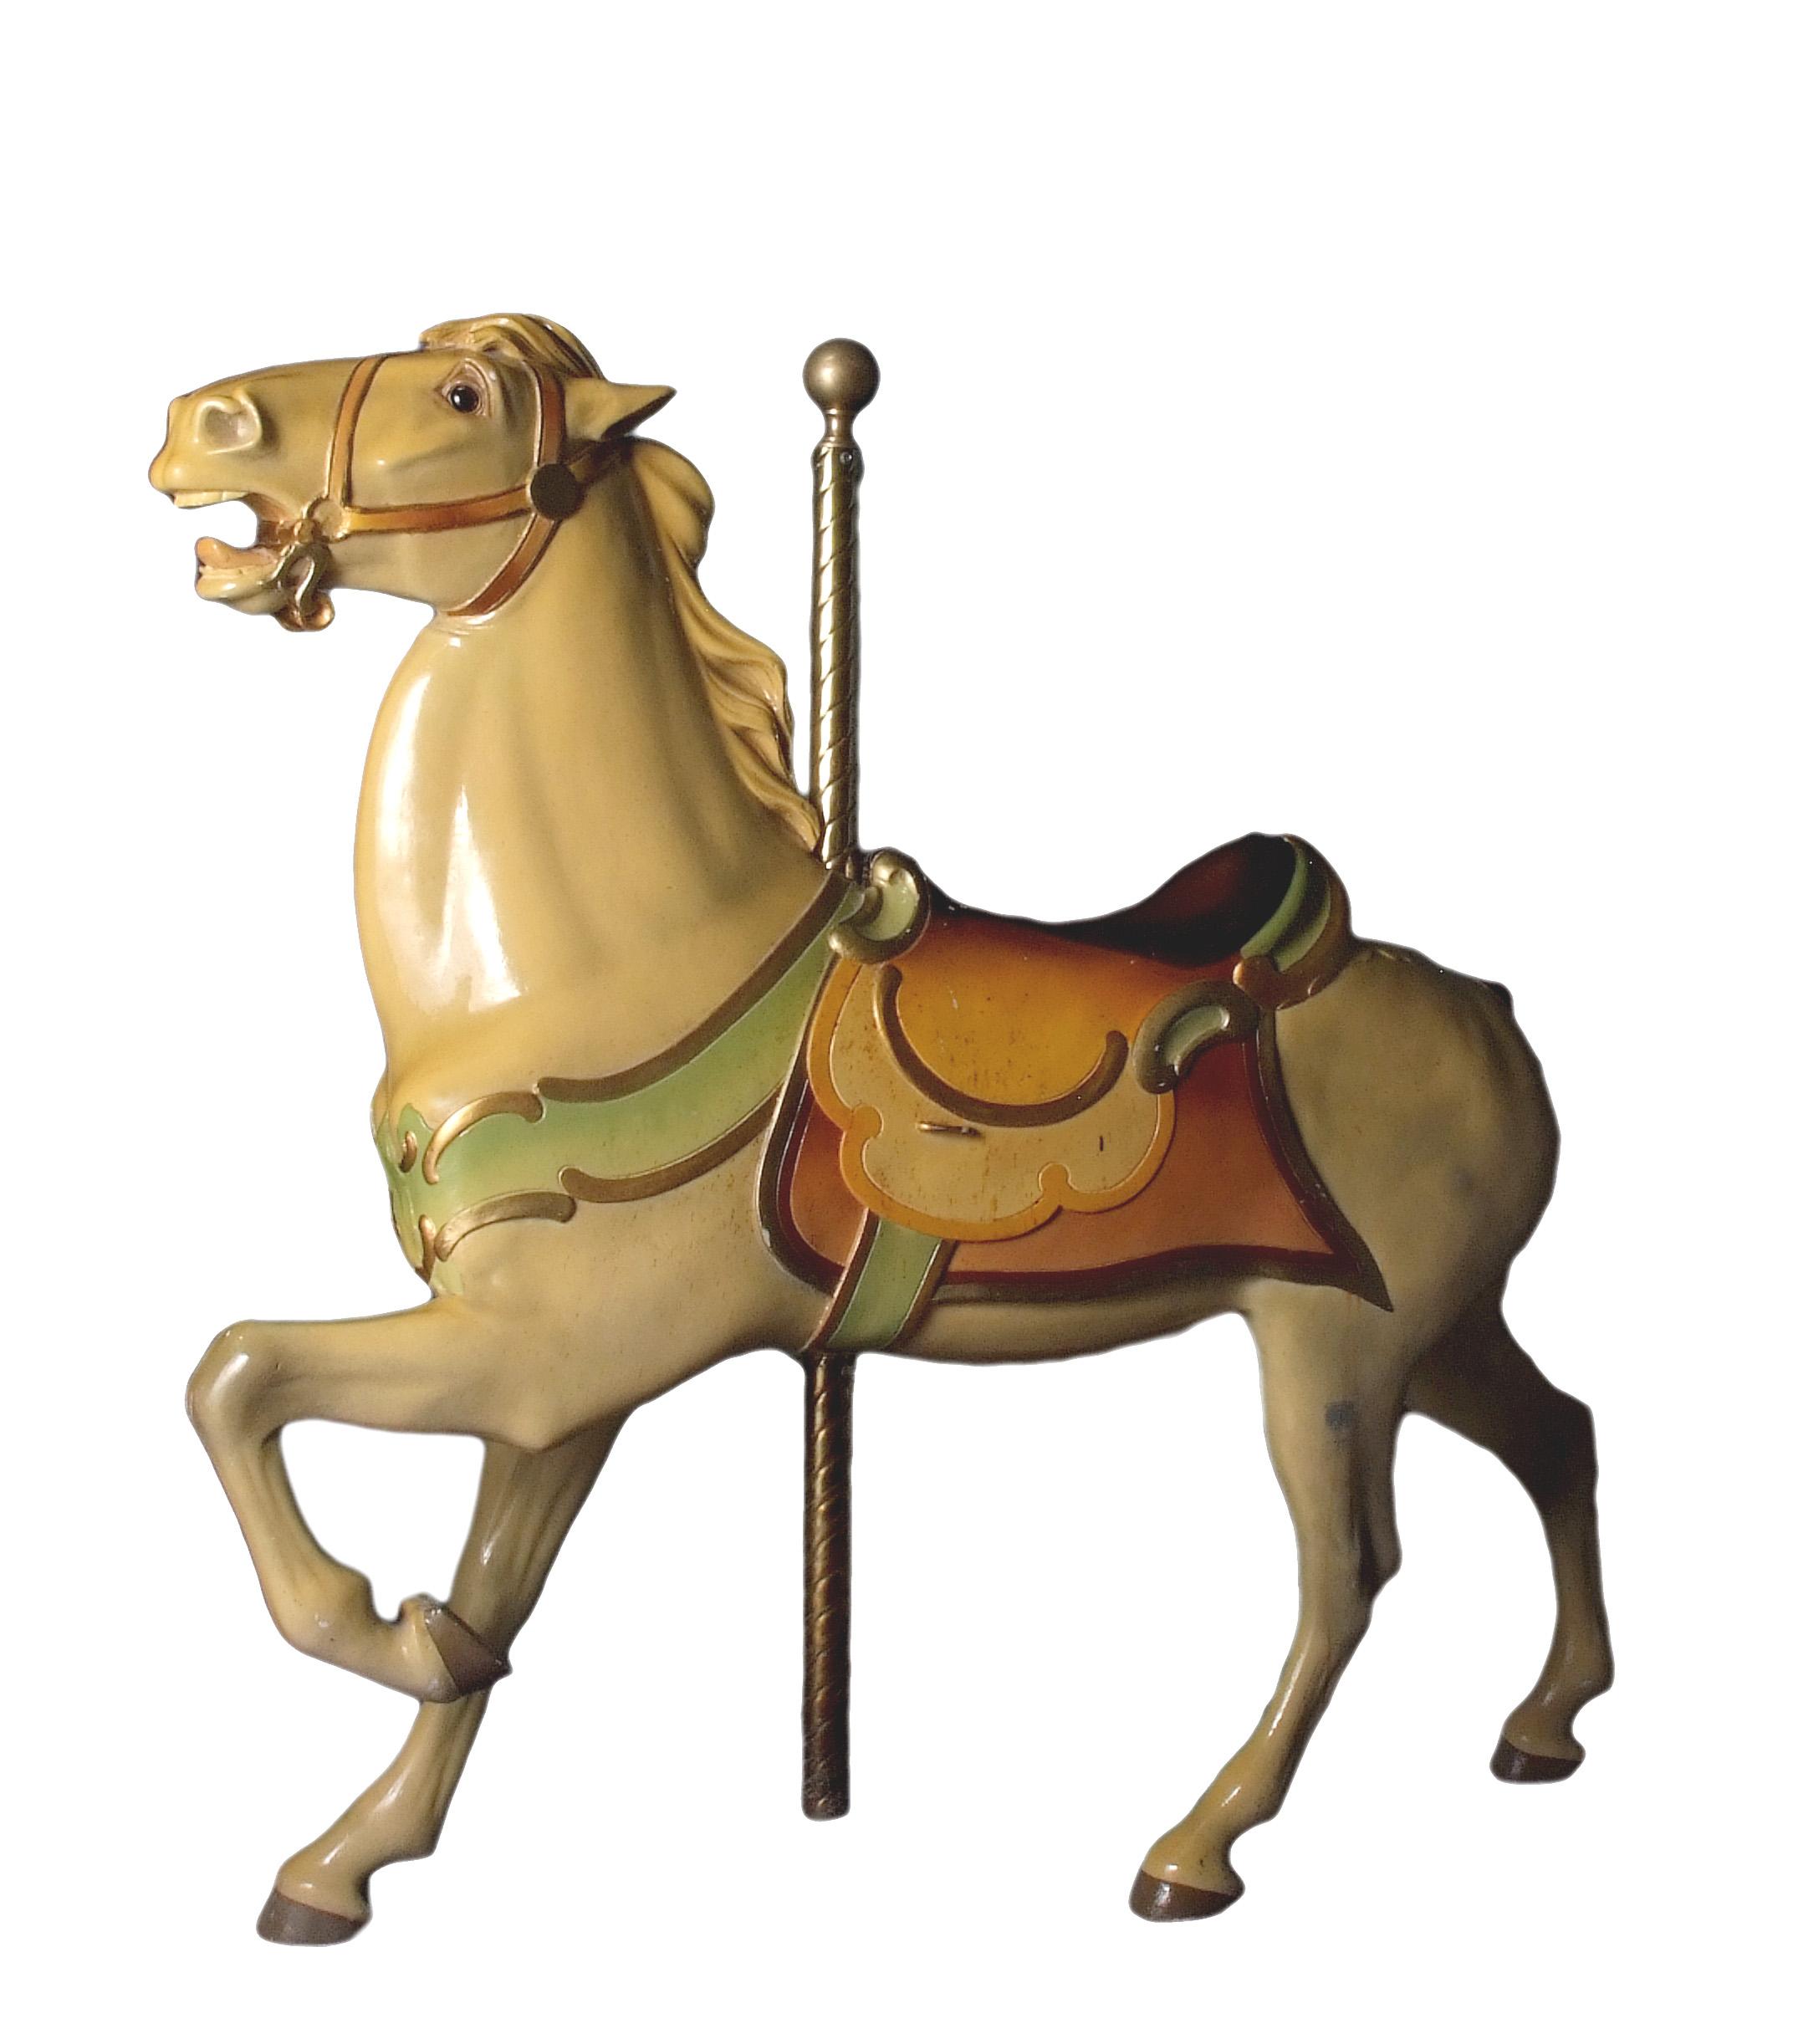 Carousel Horse #2